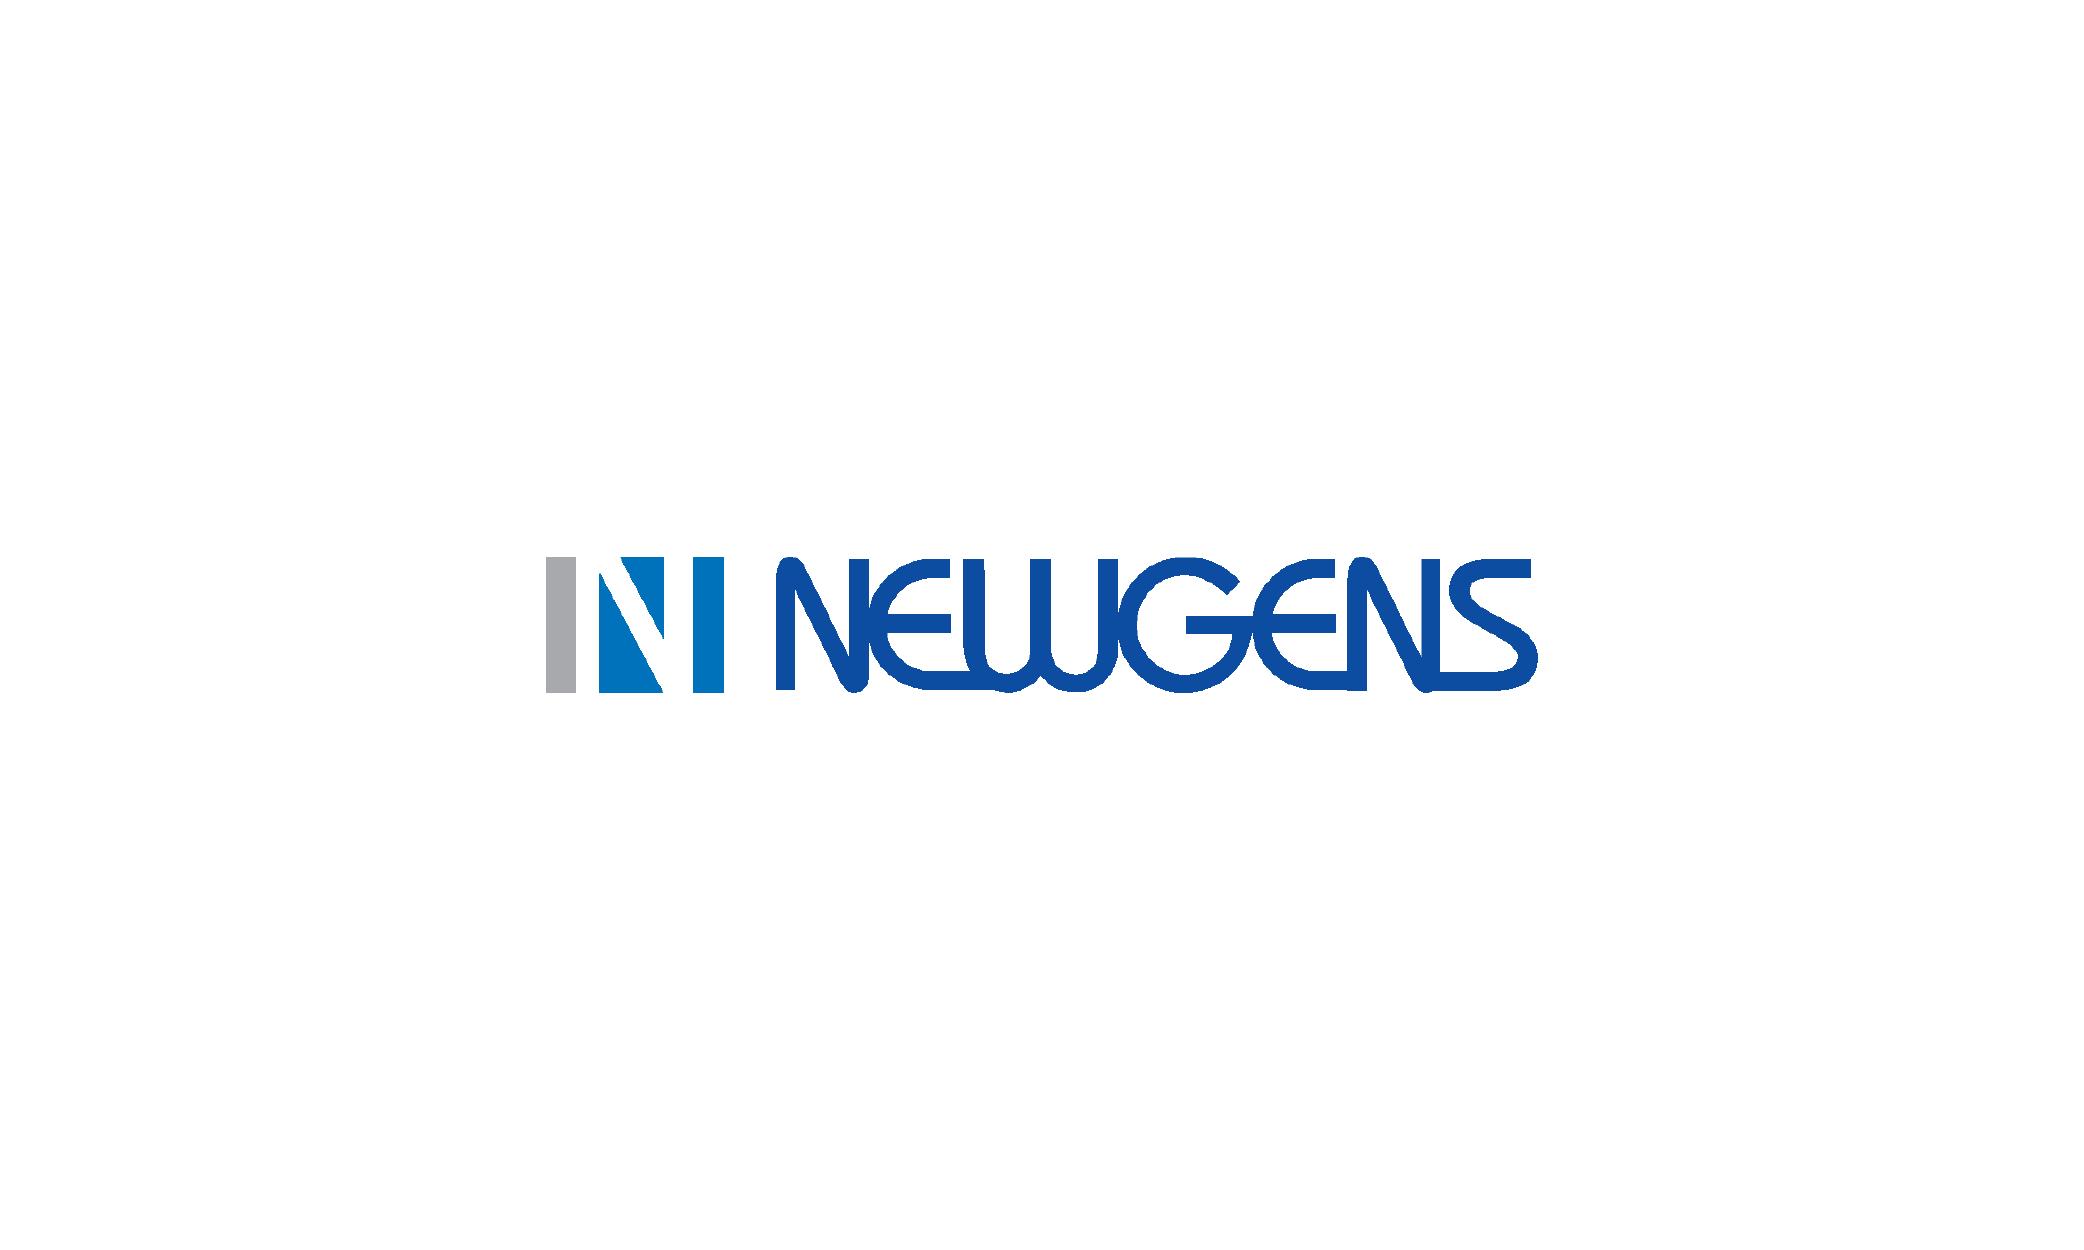 NewGens-01